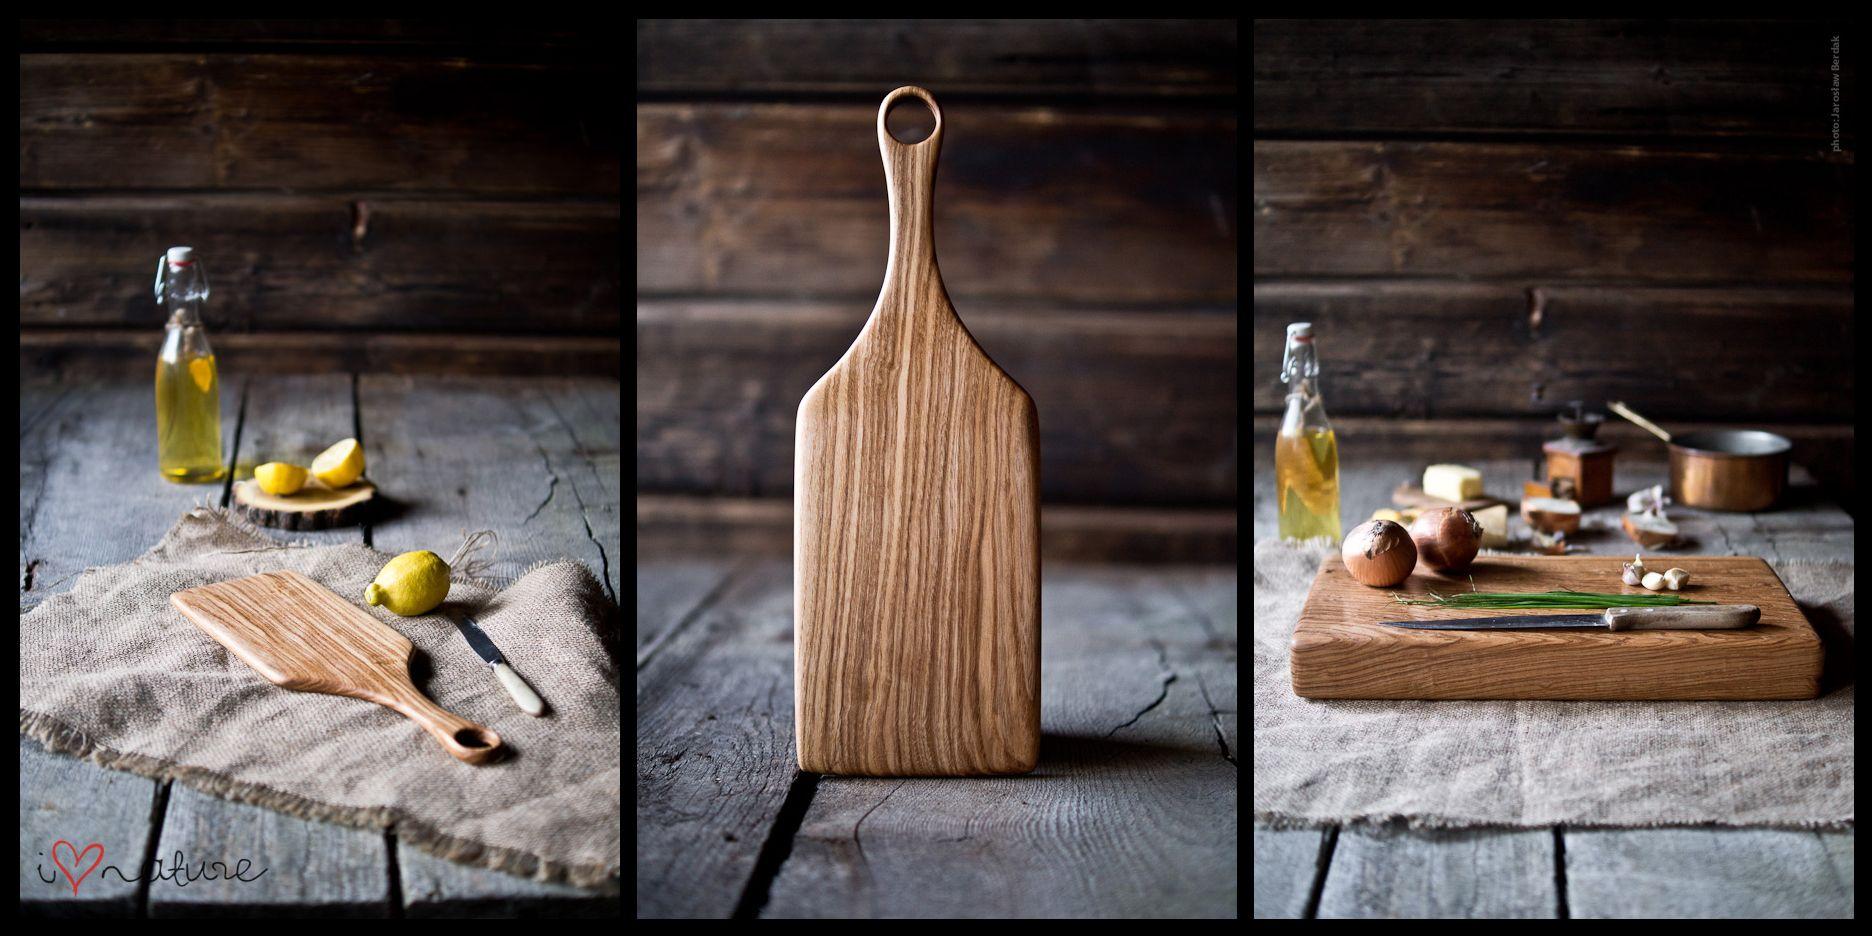 ash wood boards